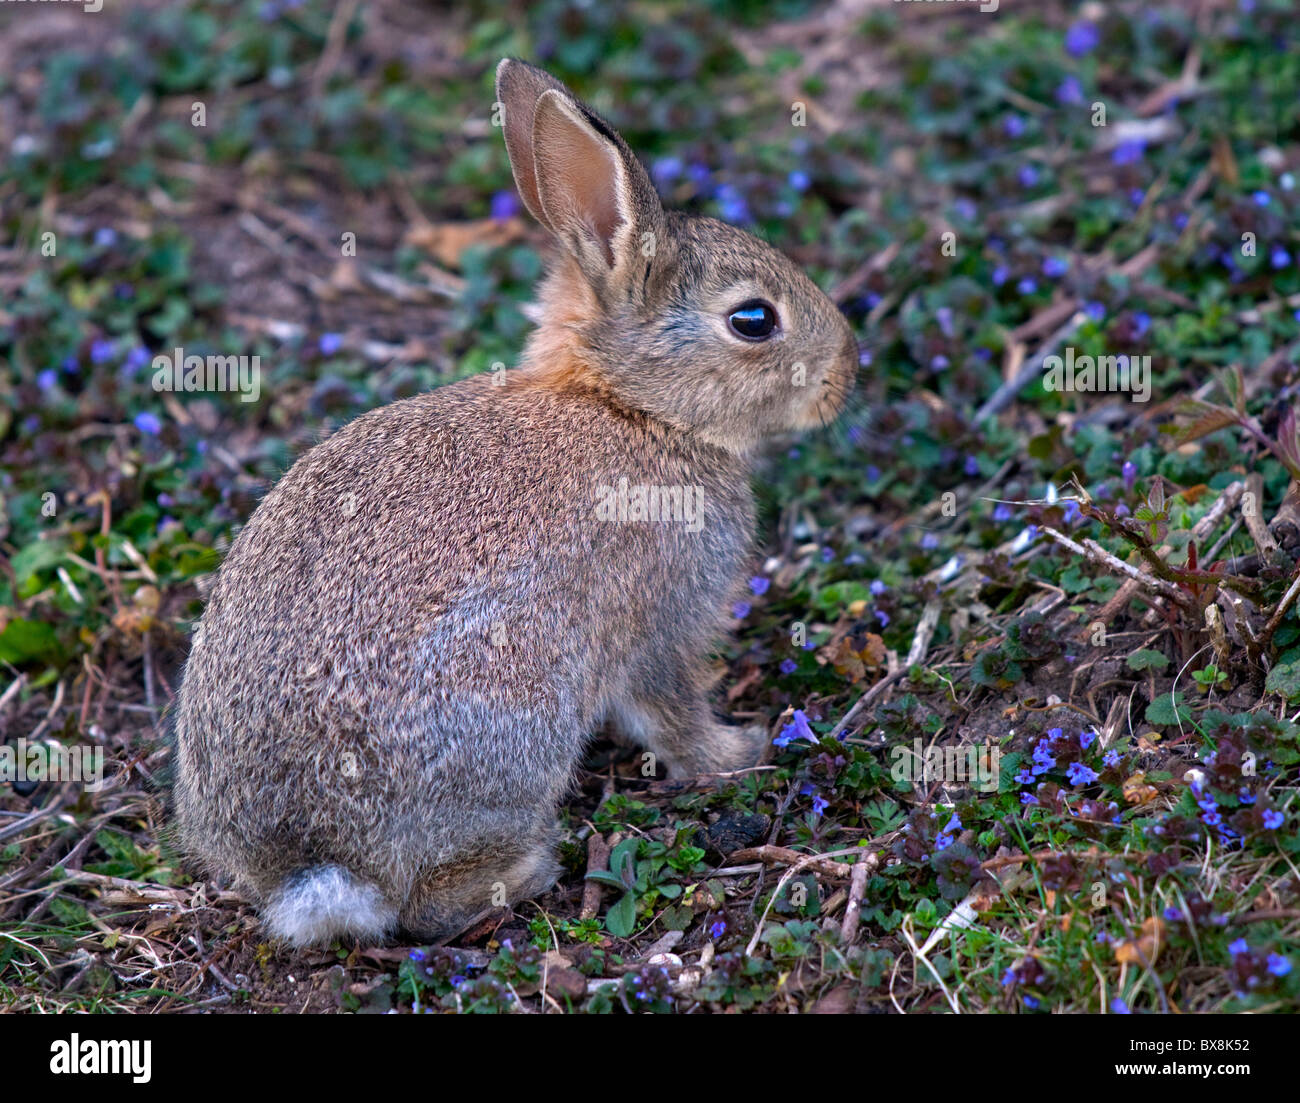 Baby Wild European Rabbit (oryctolagus cuniculus) - Stock Image